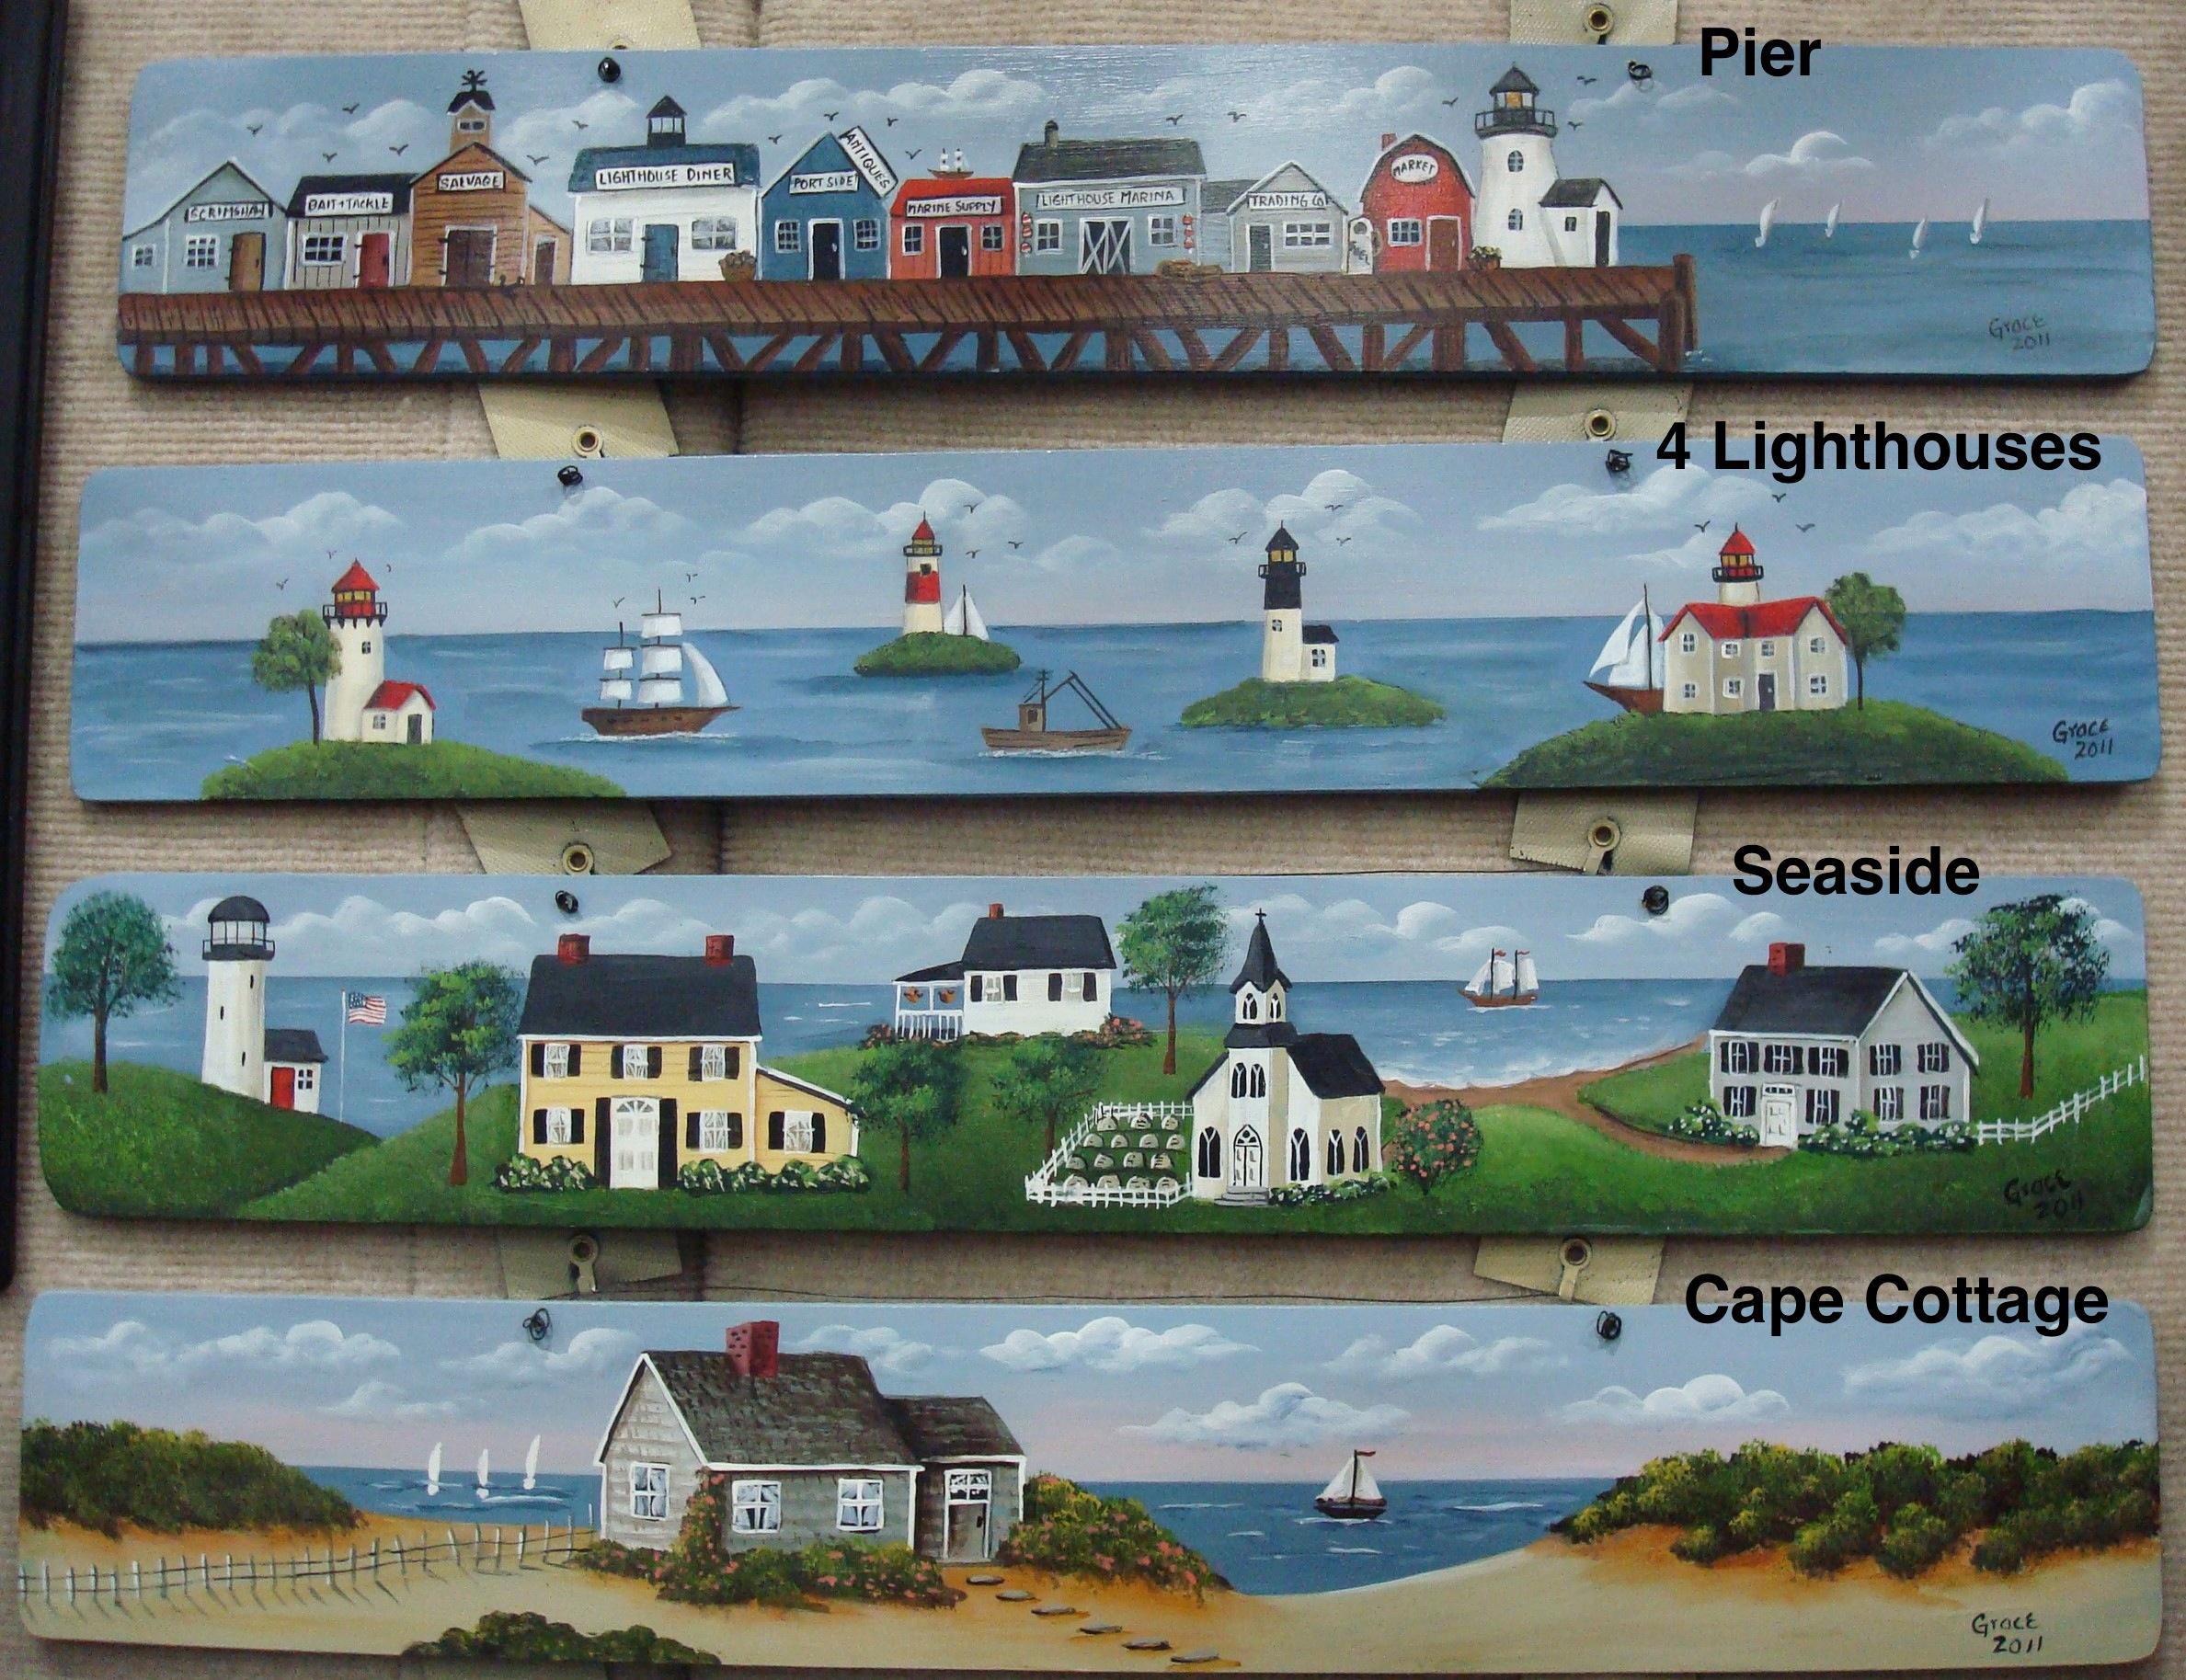 Pier / 4 Lighthouses / Seaside / Cape Cottage